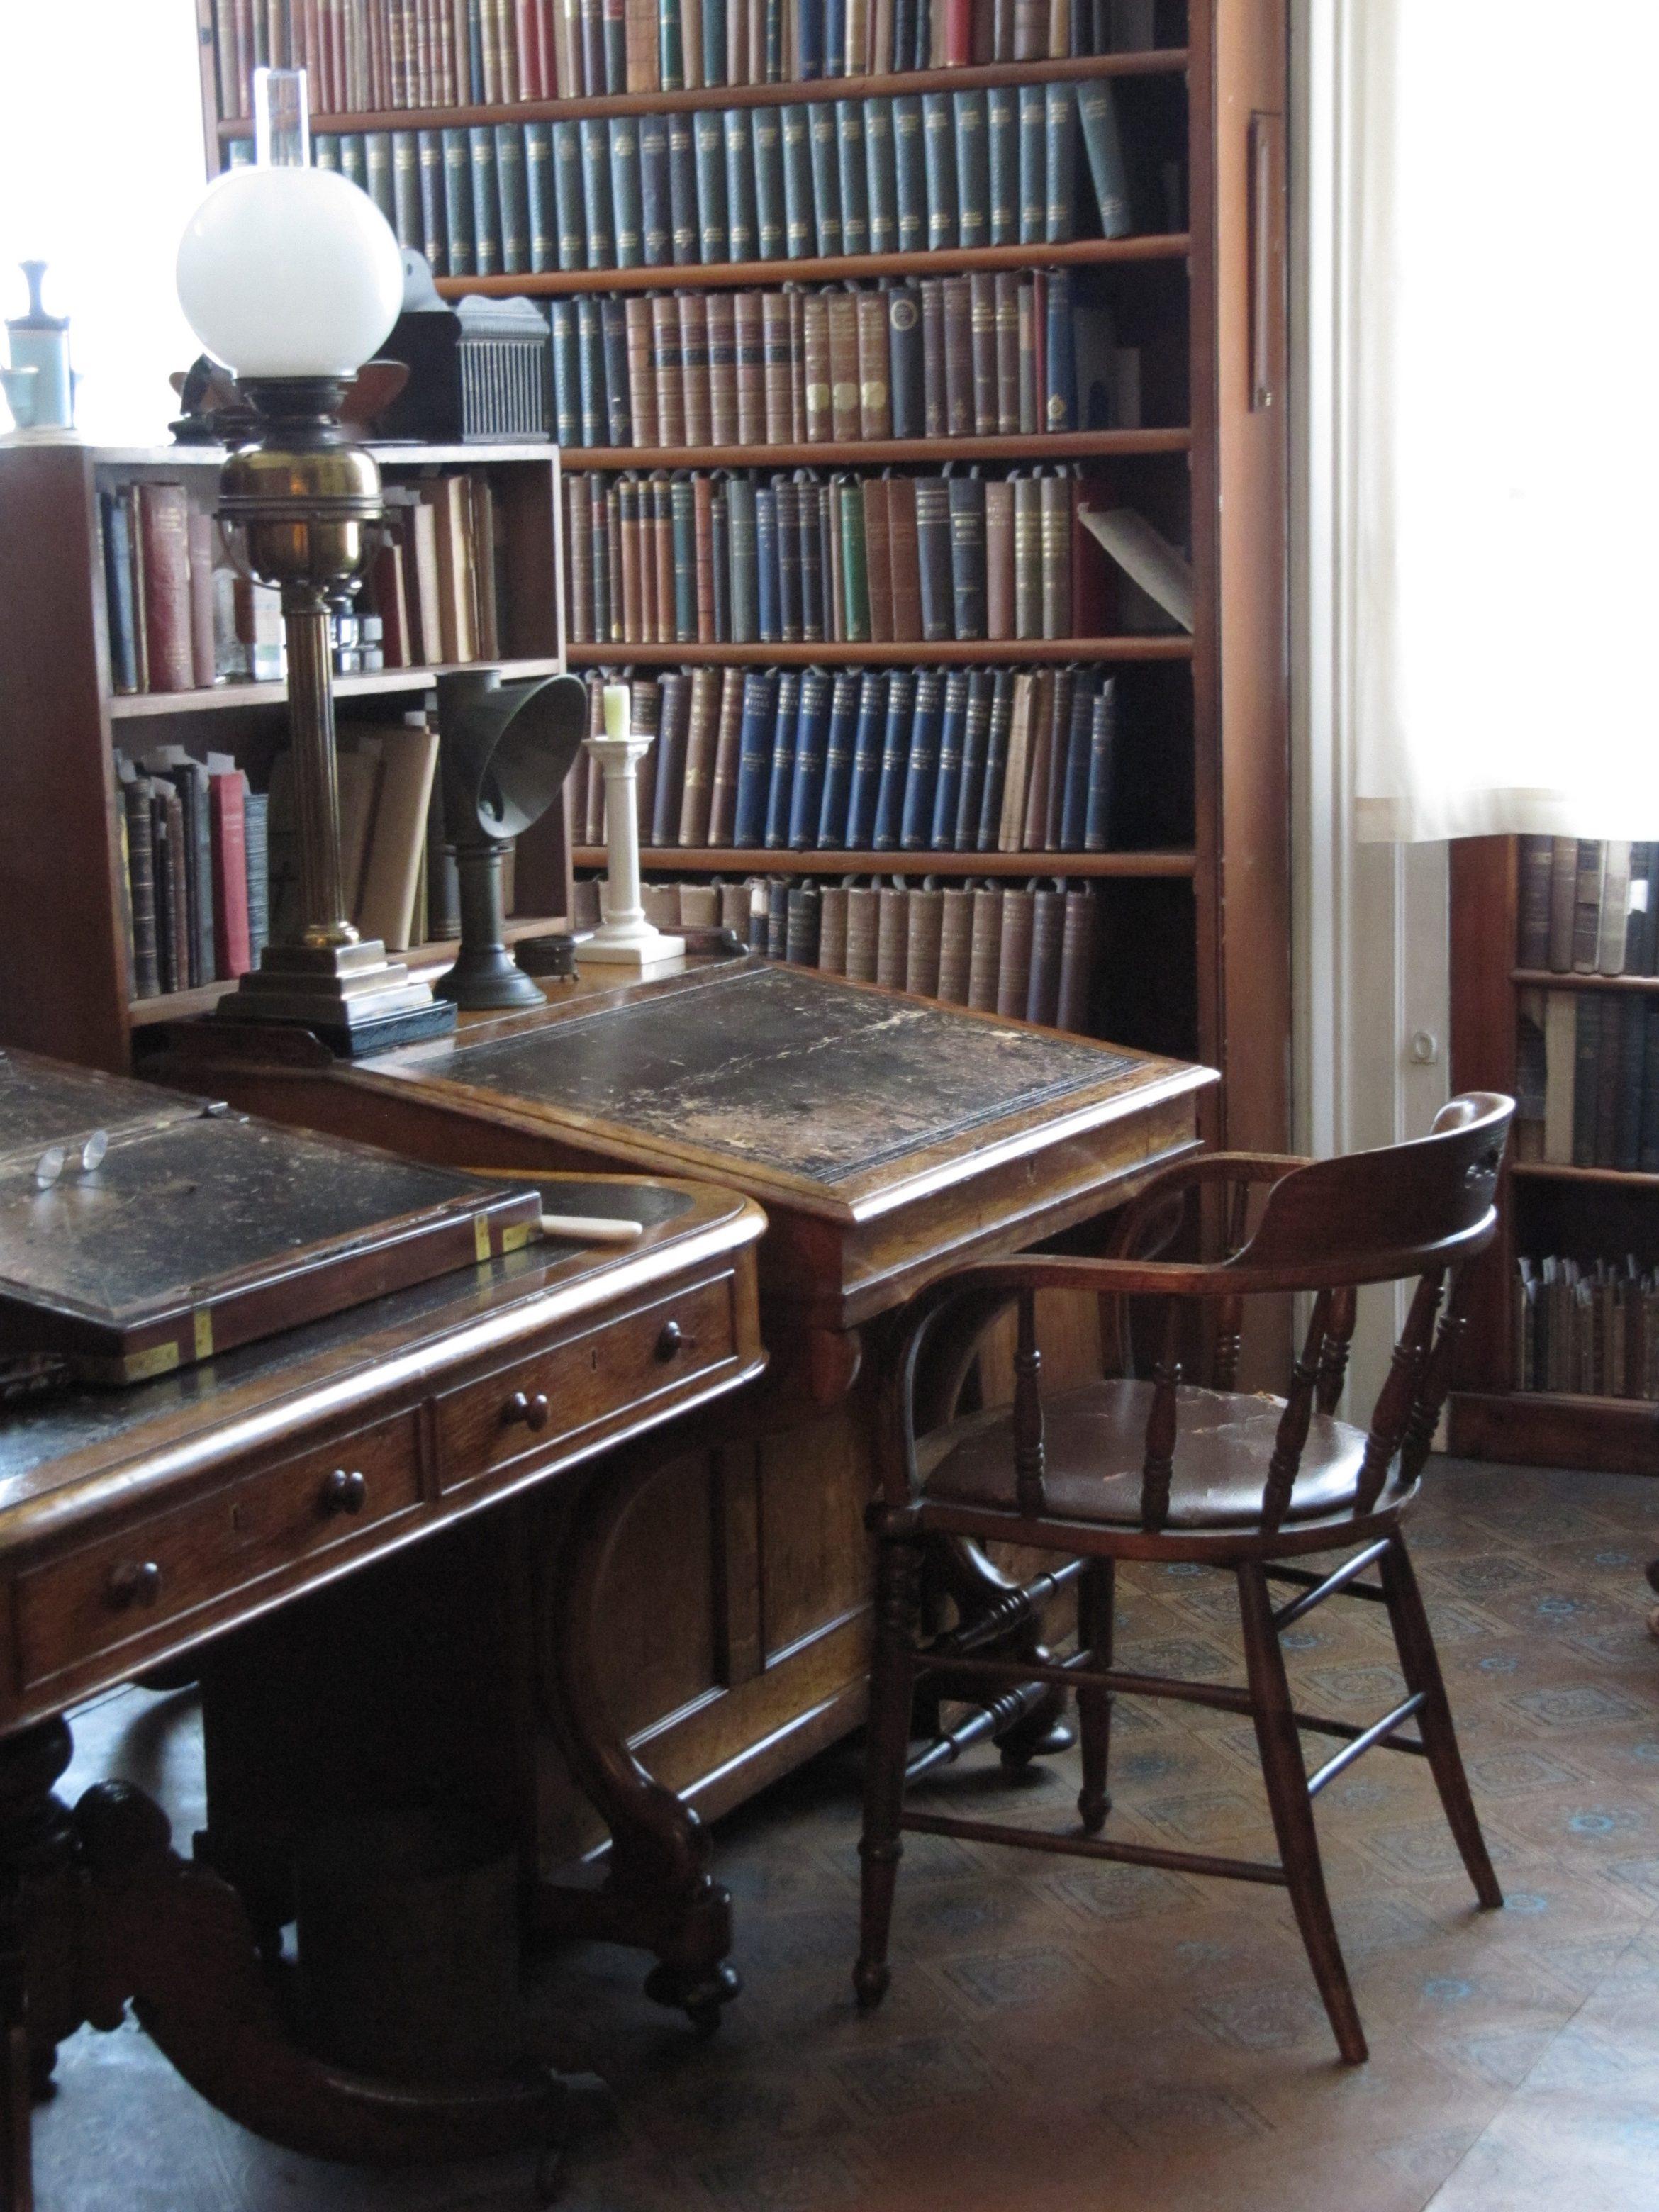 desk-copyright-birmingham-oratory-img_4655.jpg